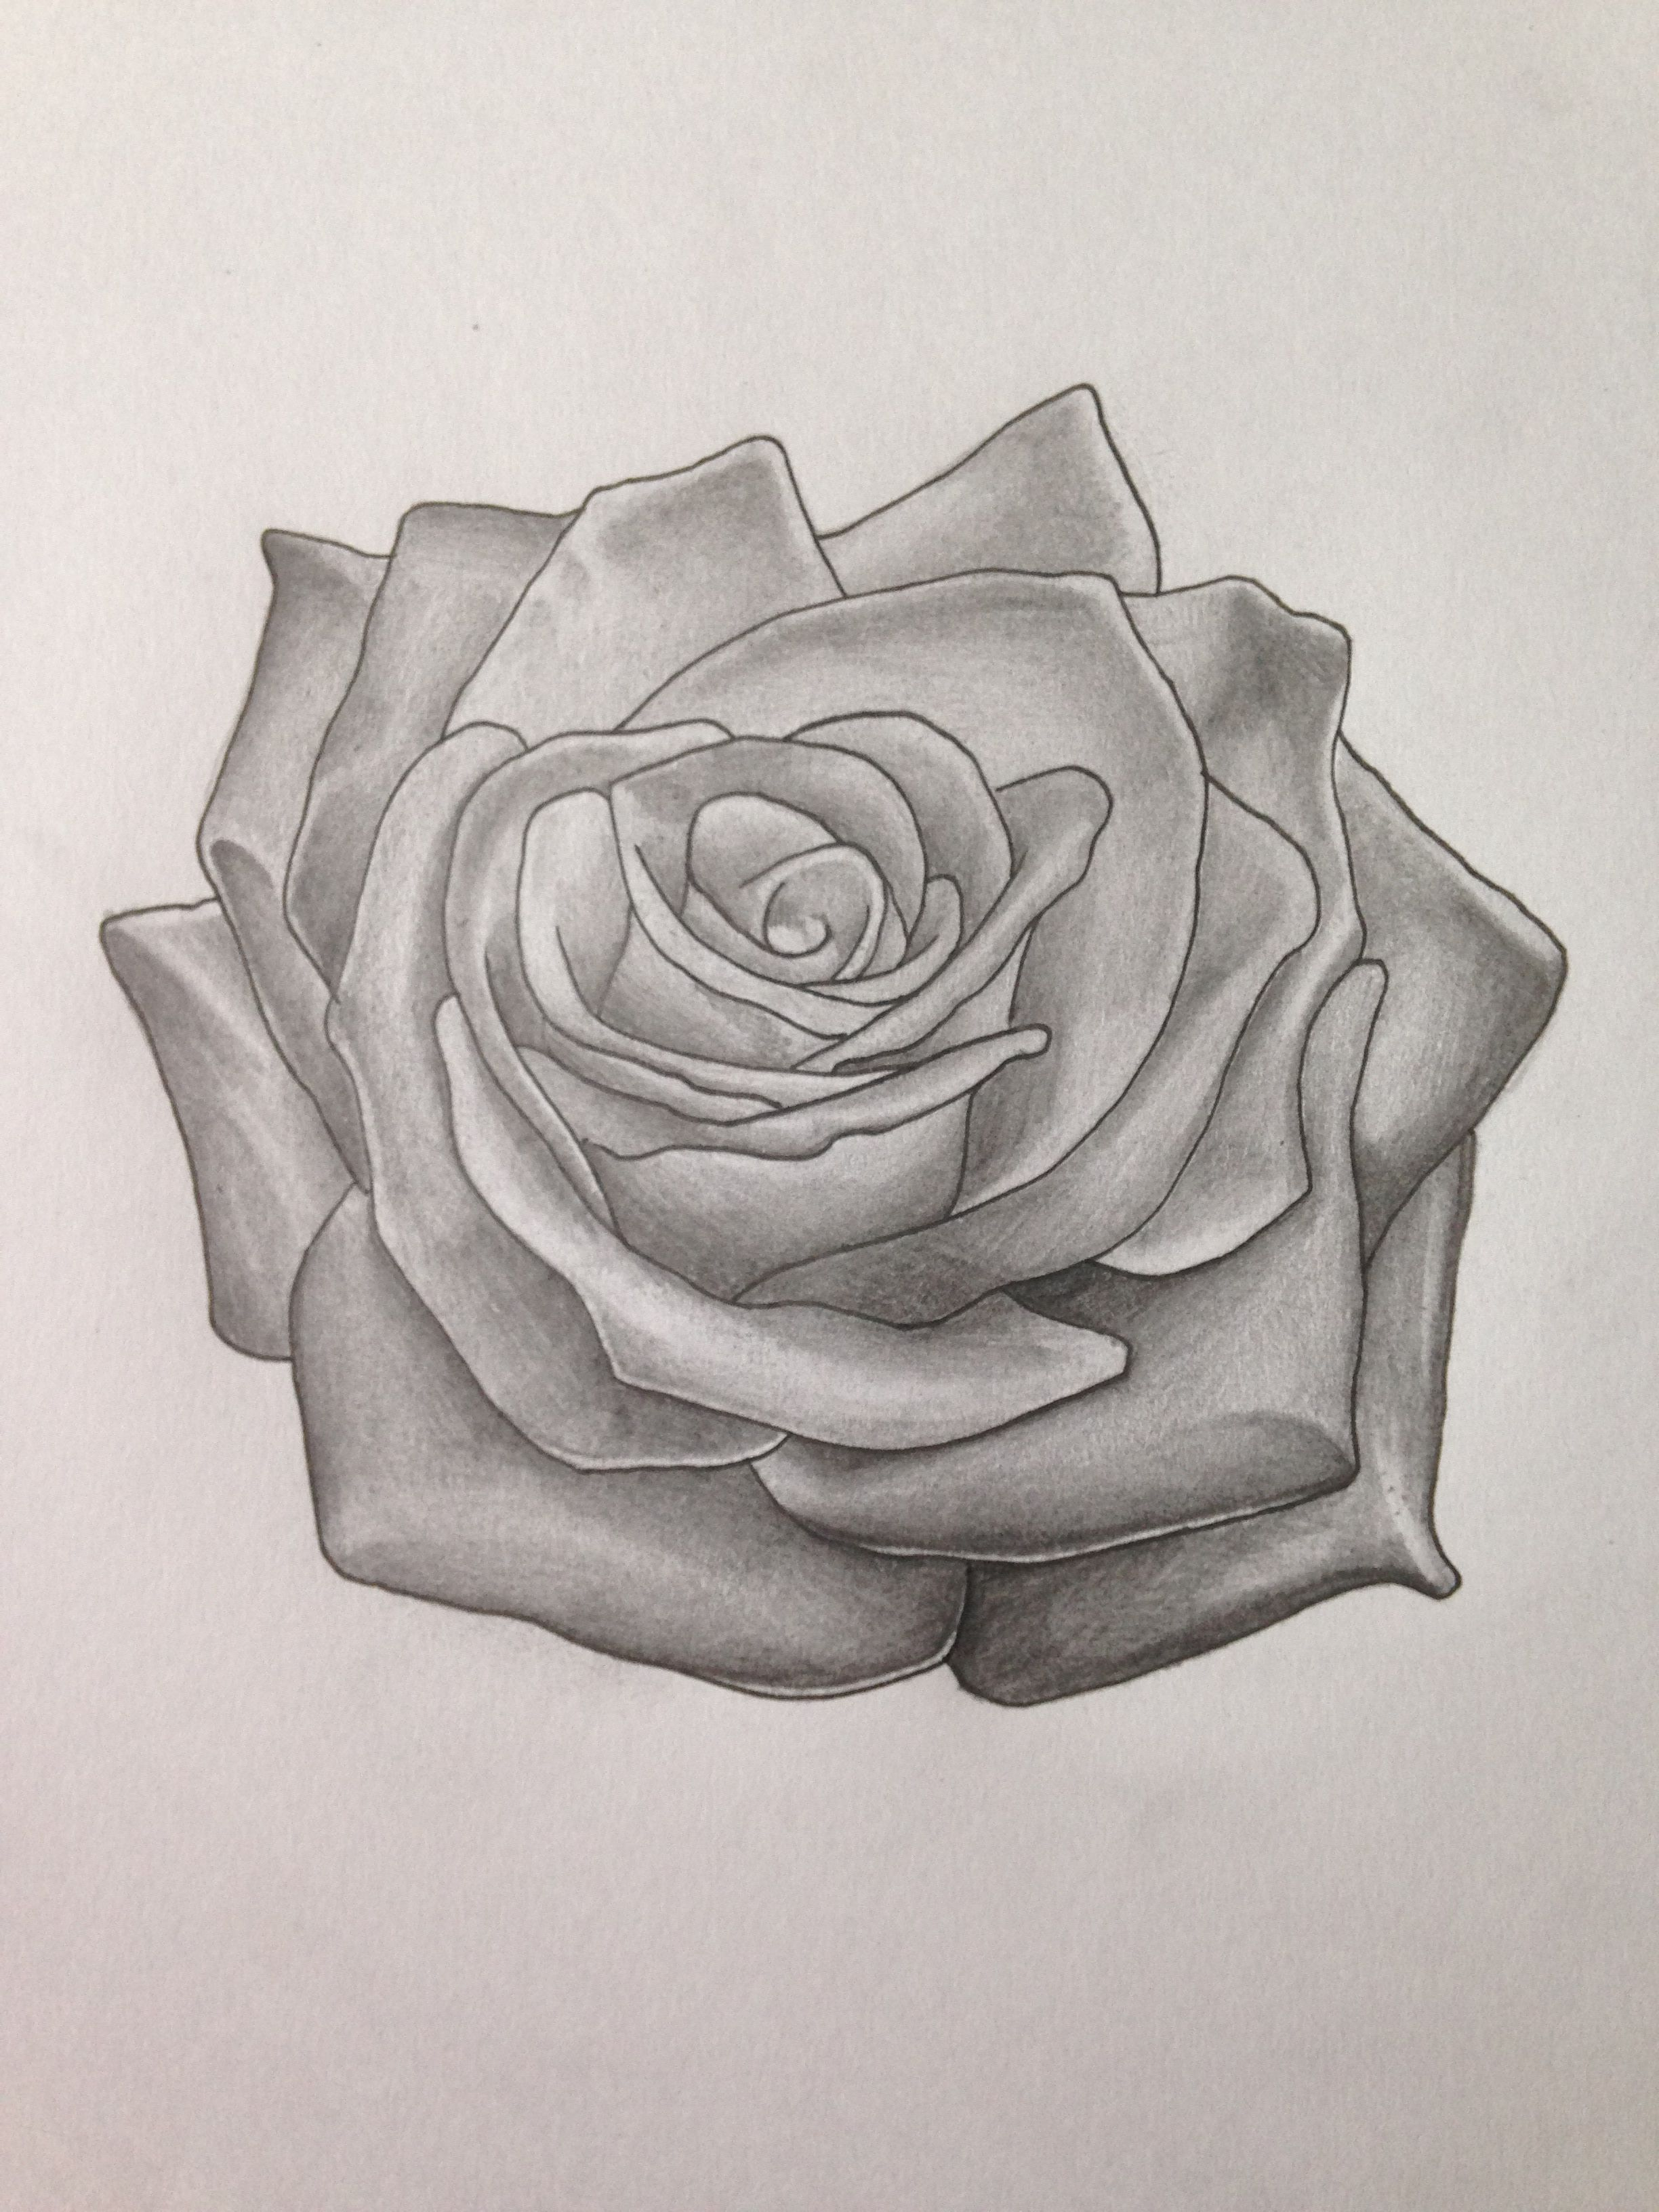 Hand Drawn Rose Tattoo Design Using Pencil Rose Tattoo Design Tattoo Designs Tattoos